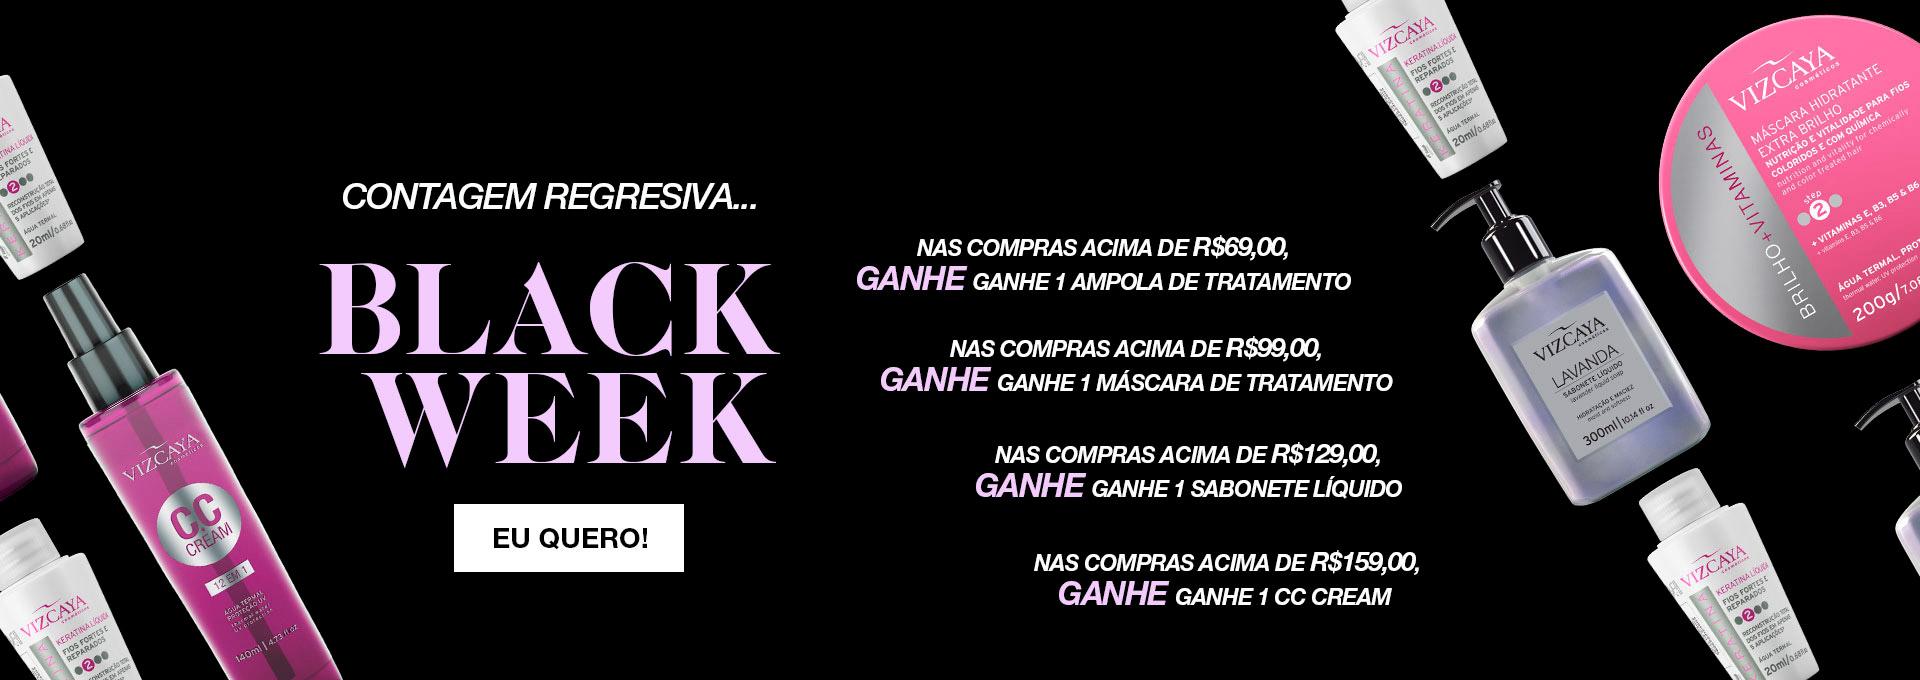 BlackWeek_CompreGanhe